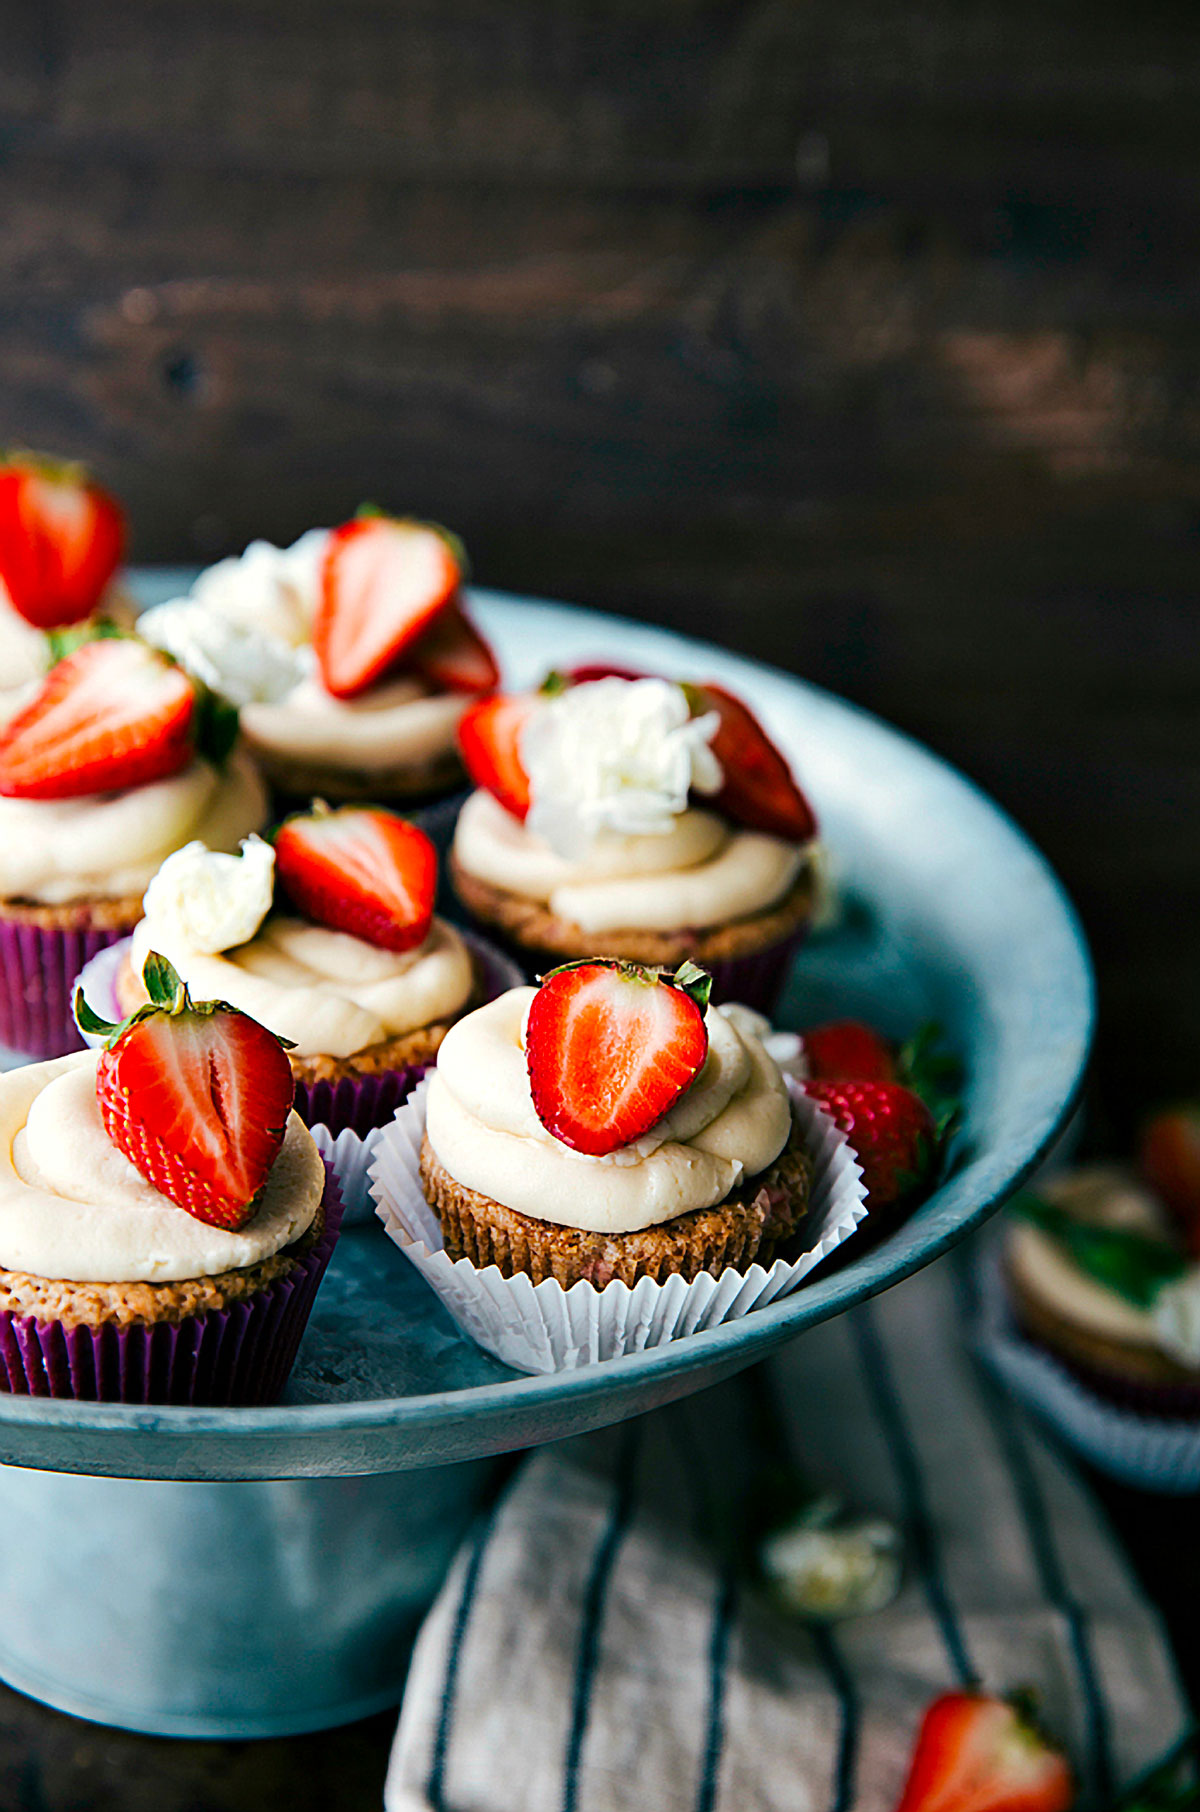 Vegan Strawberries and Cream Cupcakes